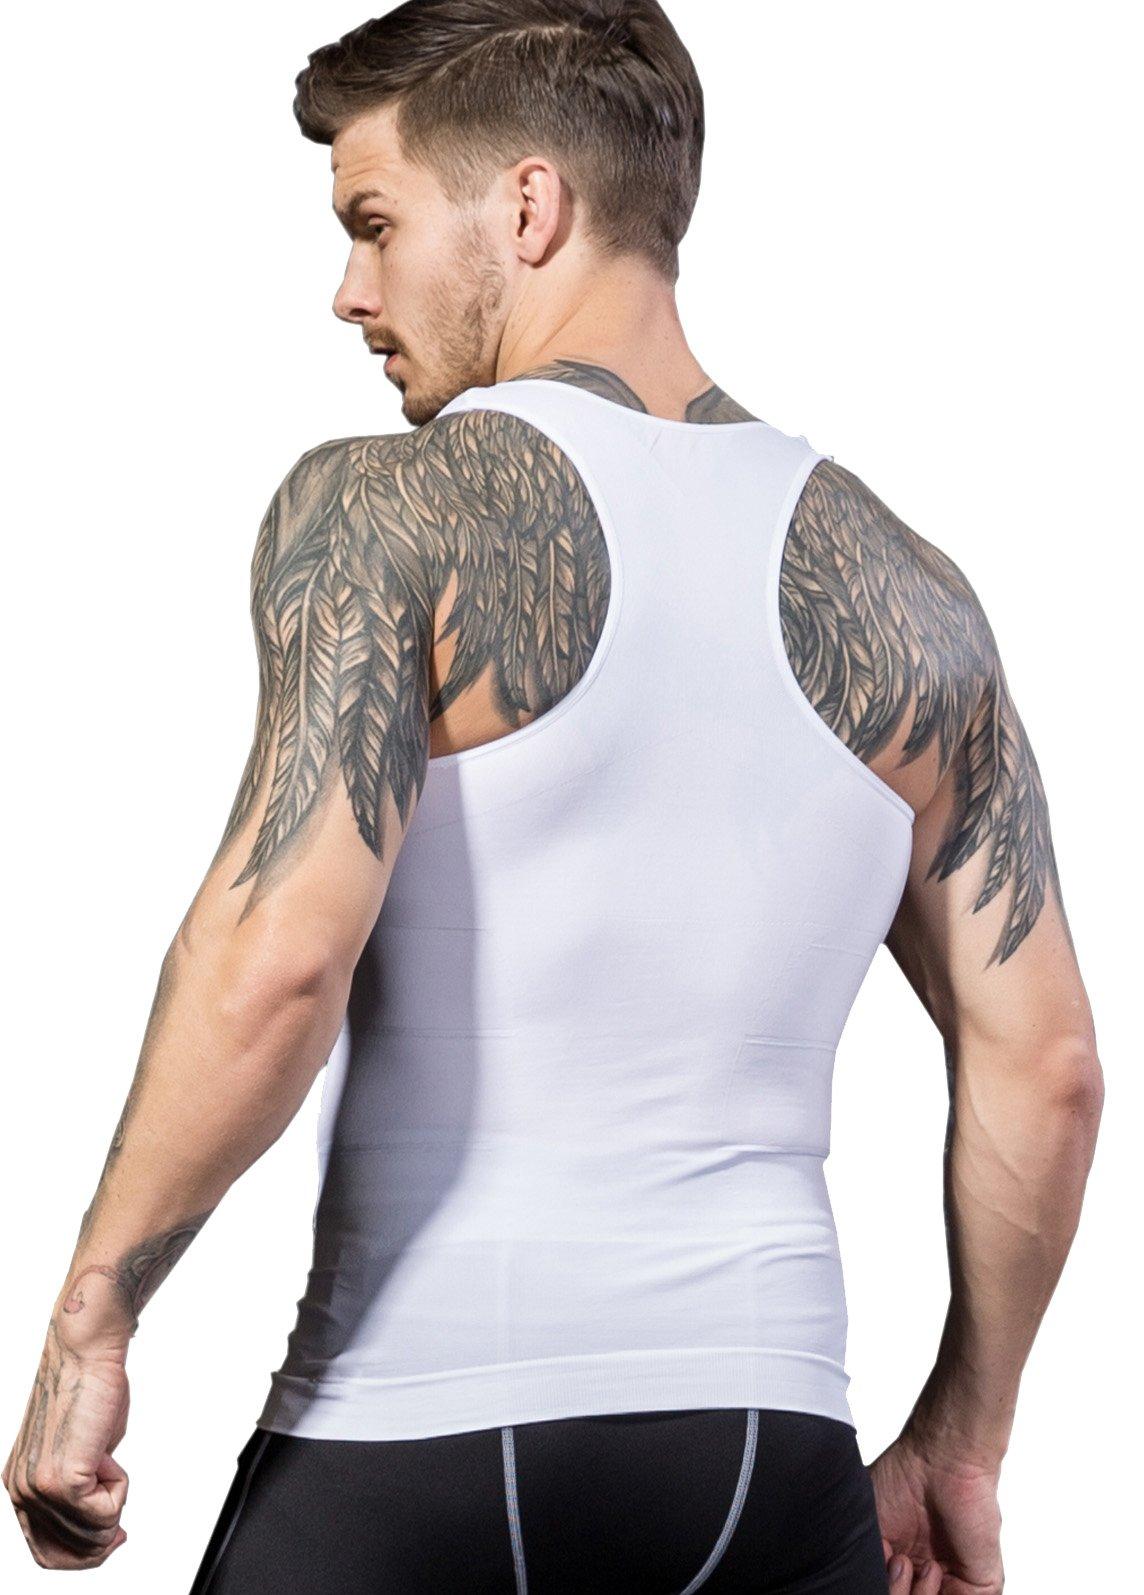 BXUSOZL Men's Slimming Body Shaper Compression Vest Shirt,Y-Back Slim Fit Seamless Undershirt Shapewear,Abdomen Slim (White, L)